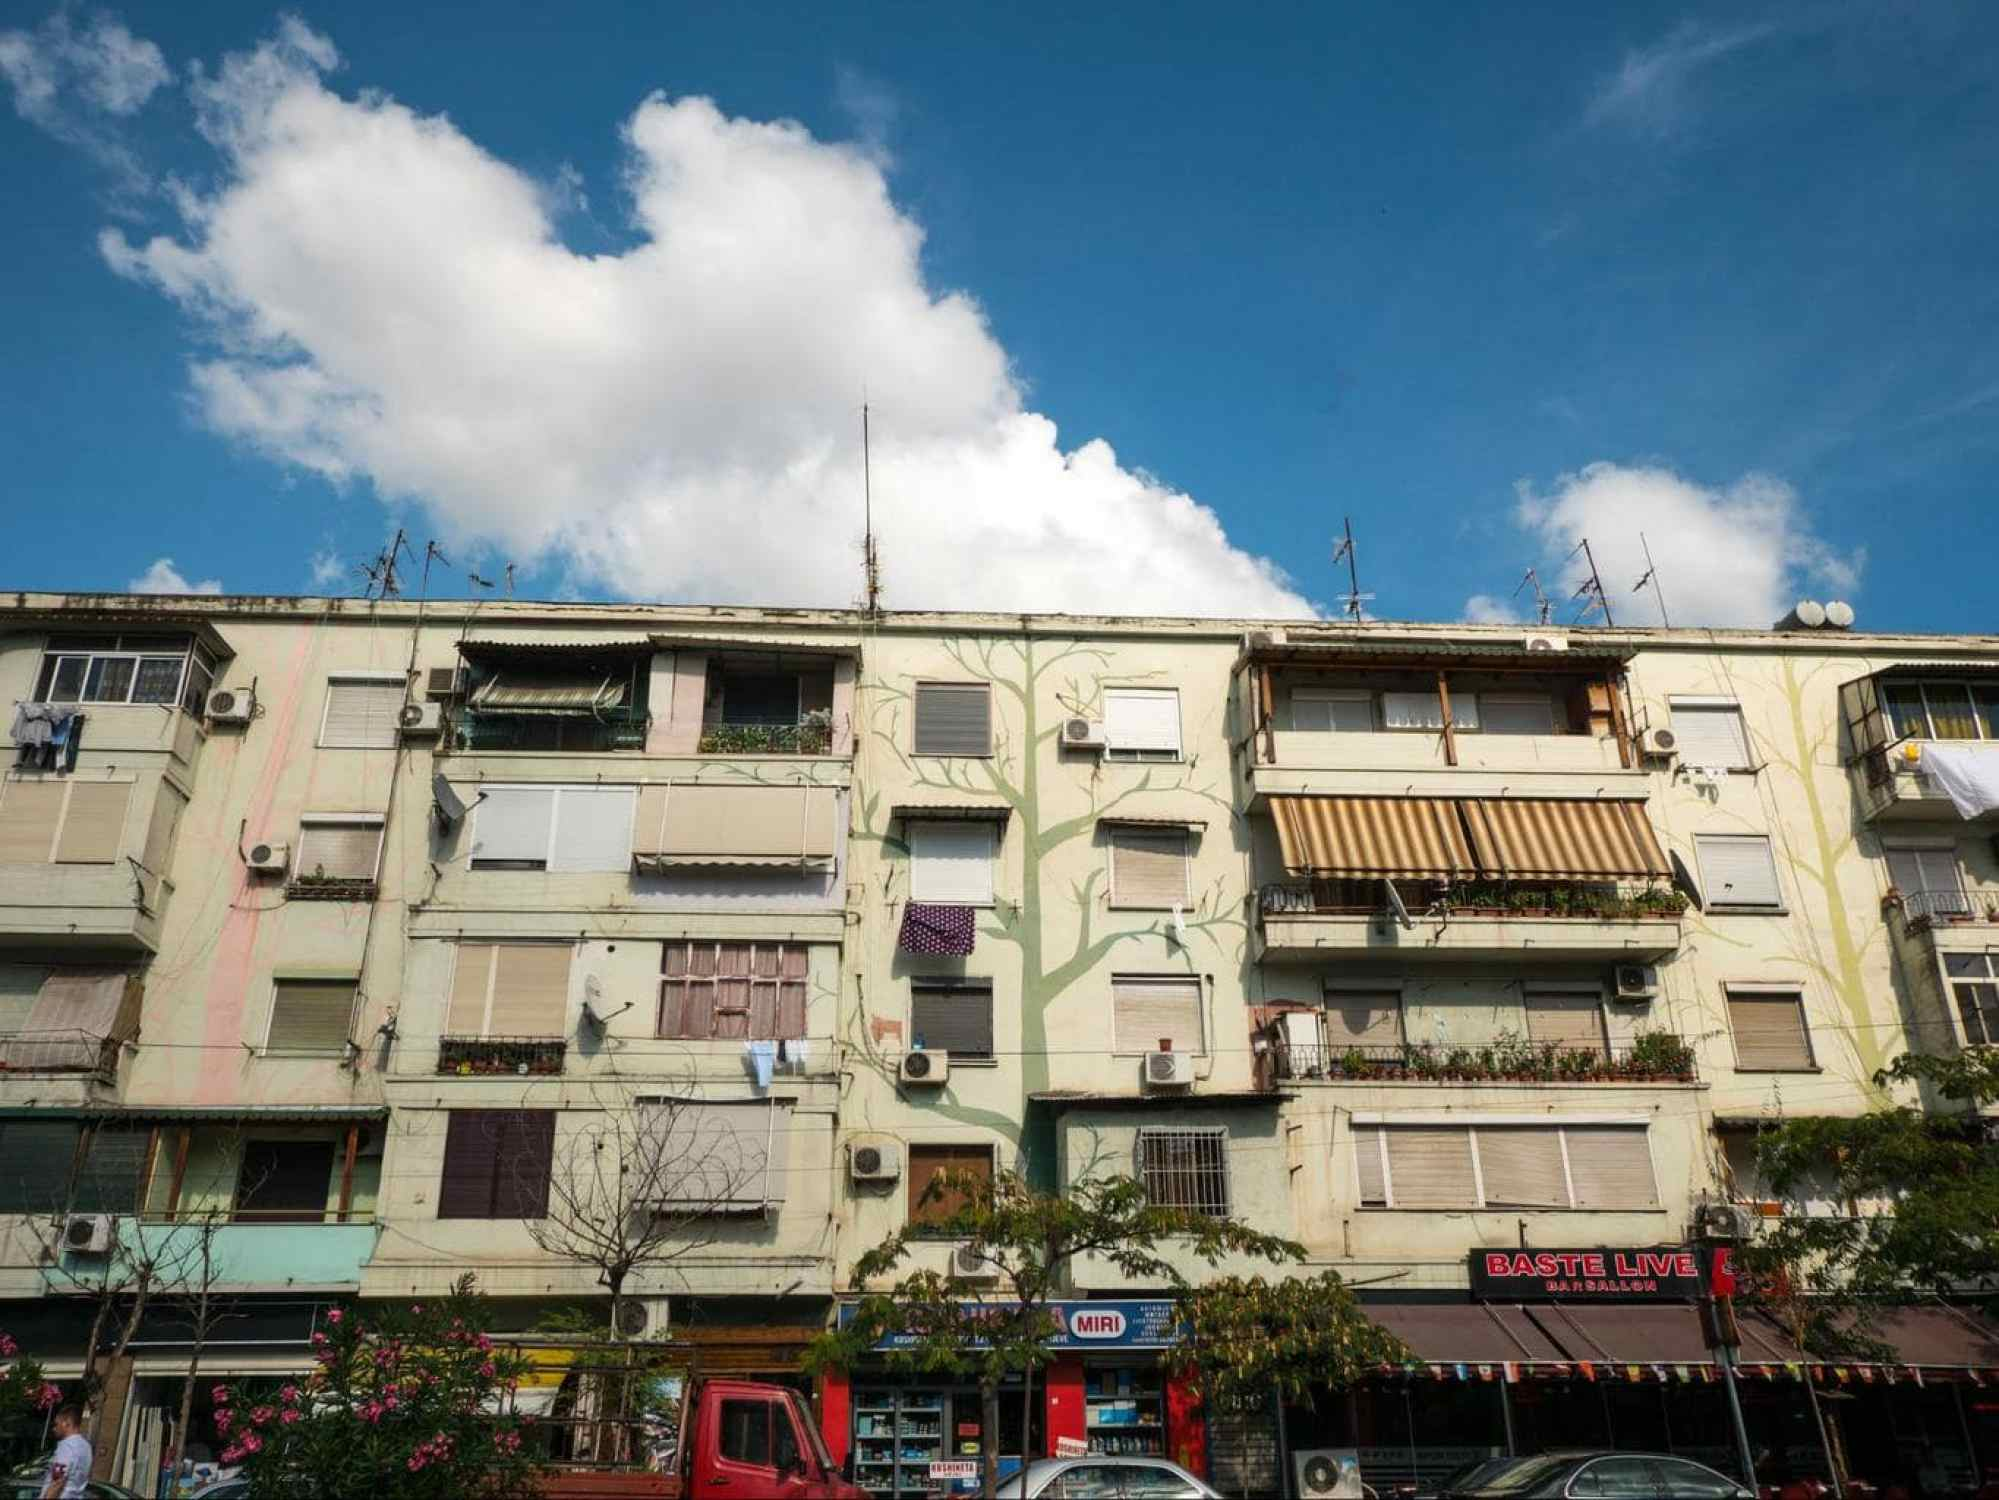 Tree murals on Tirana's buildings